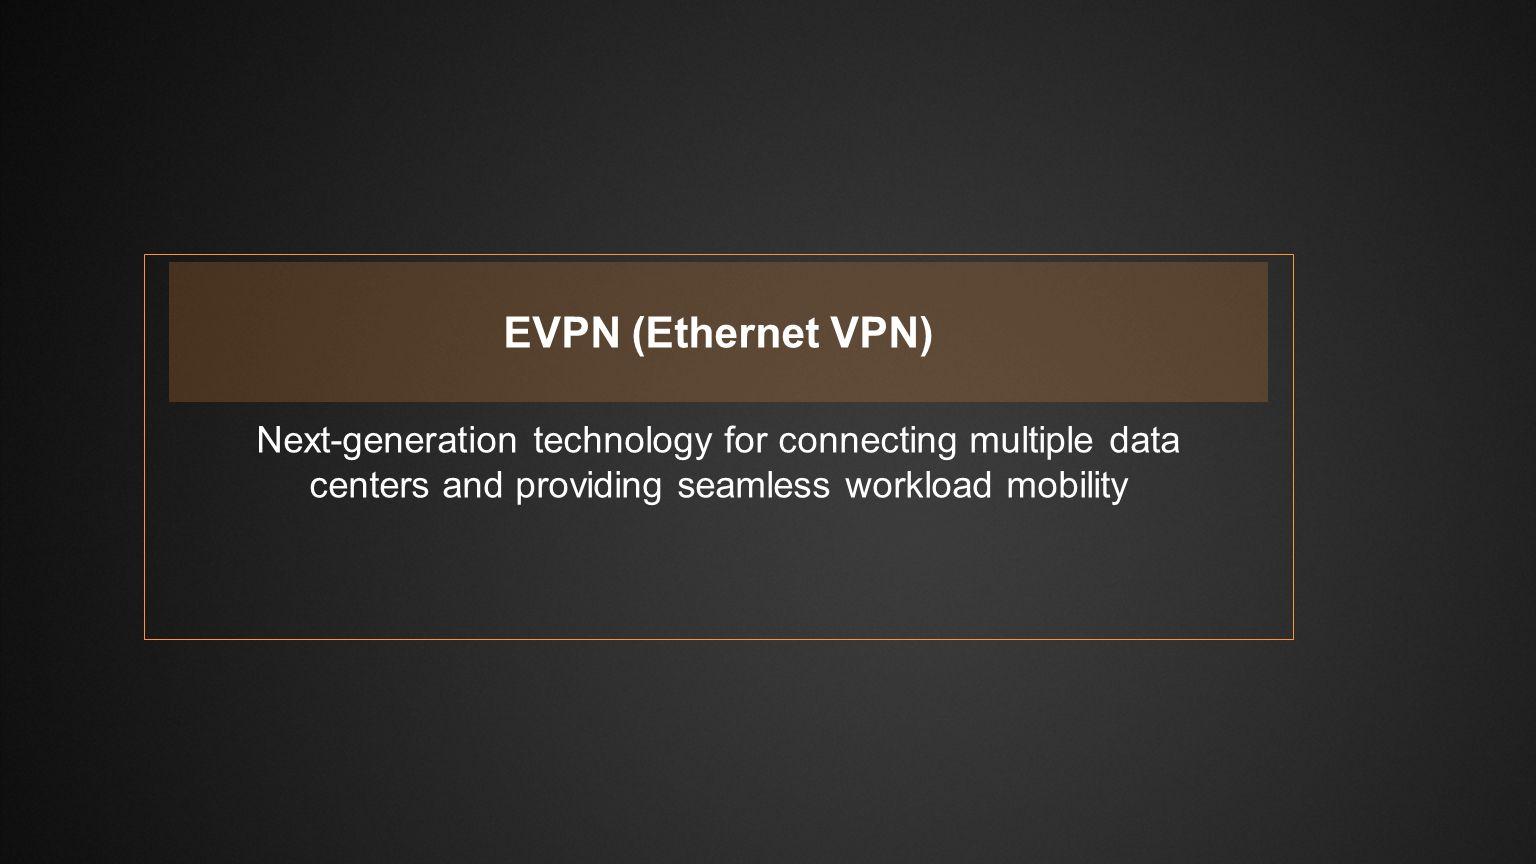 Slide Type Juniper Networks Large Venue Template / 16x9 / V6 Blank SlideTitle and Content 1-Line PRIVATE MPLS WAN without EVPN VLAN 10 PRE-EVPN: LAYER 2 STRETCH BETWEEN DATA CENTERS EVPN (Ethernet VPN) EVPN (Ethernet VPN) DATA CENTER 1 VLAN 10 DATA CENTER 2 ✕ MAC: AA Server 1 xe-1/0/0.10 MAC: BB Server 2 ge-1/0/0.10 MACVLANInterfaces BB10xe-1/0/0.10 Router 2's MAC Table ge-1/0/0.10 MACVLANInterfaces AA10xe-1/0/0.10 Router 1's MAC Table